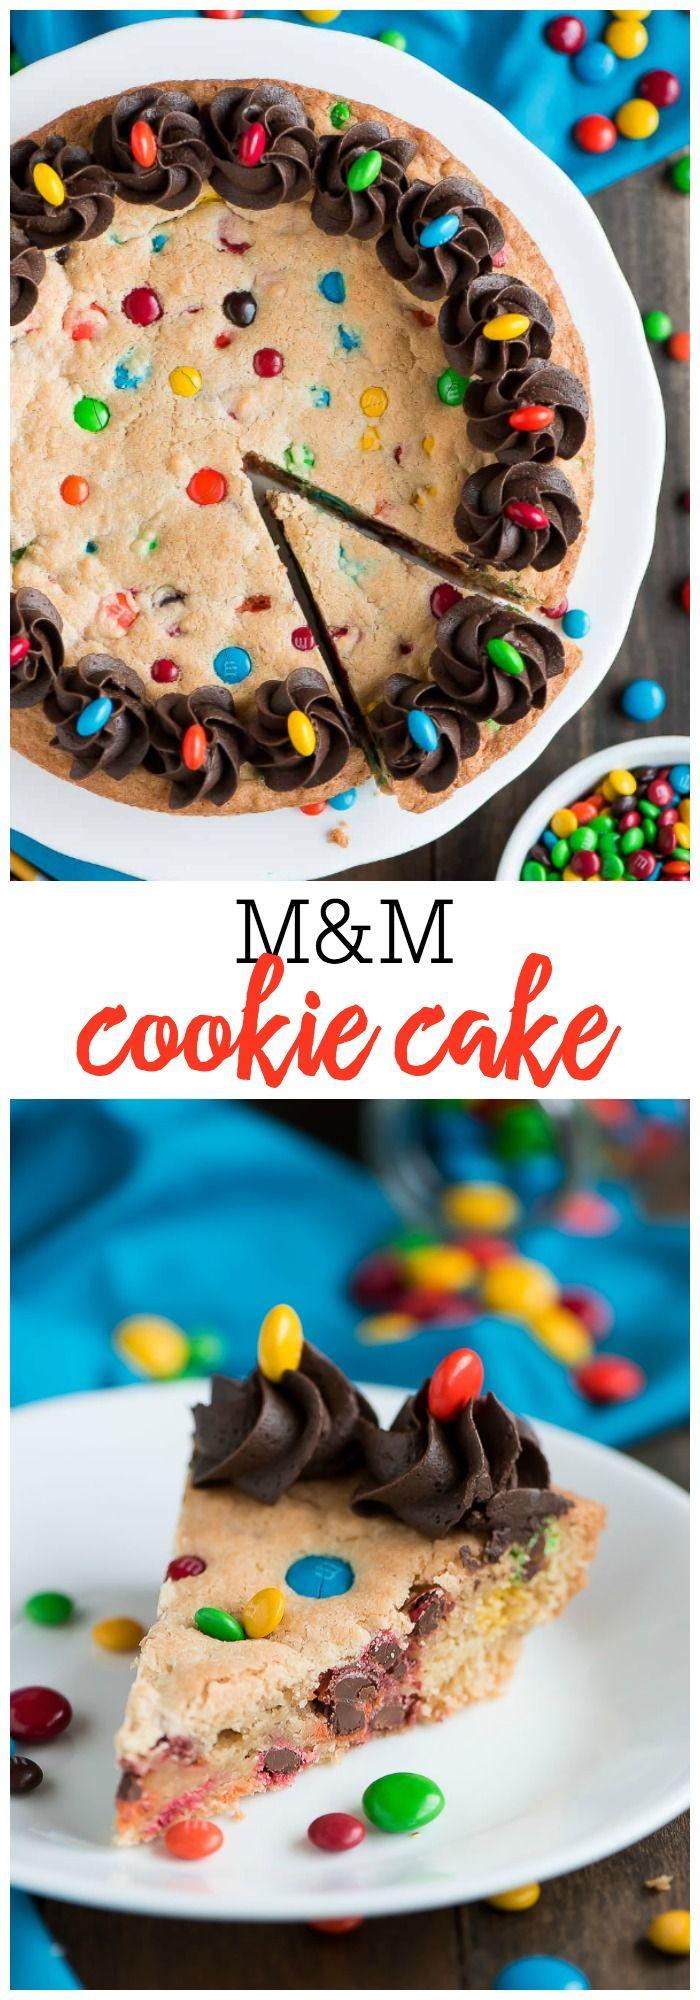 Best 25 M m cake ideas on Pinterest Chocolate birthday cakes